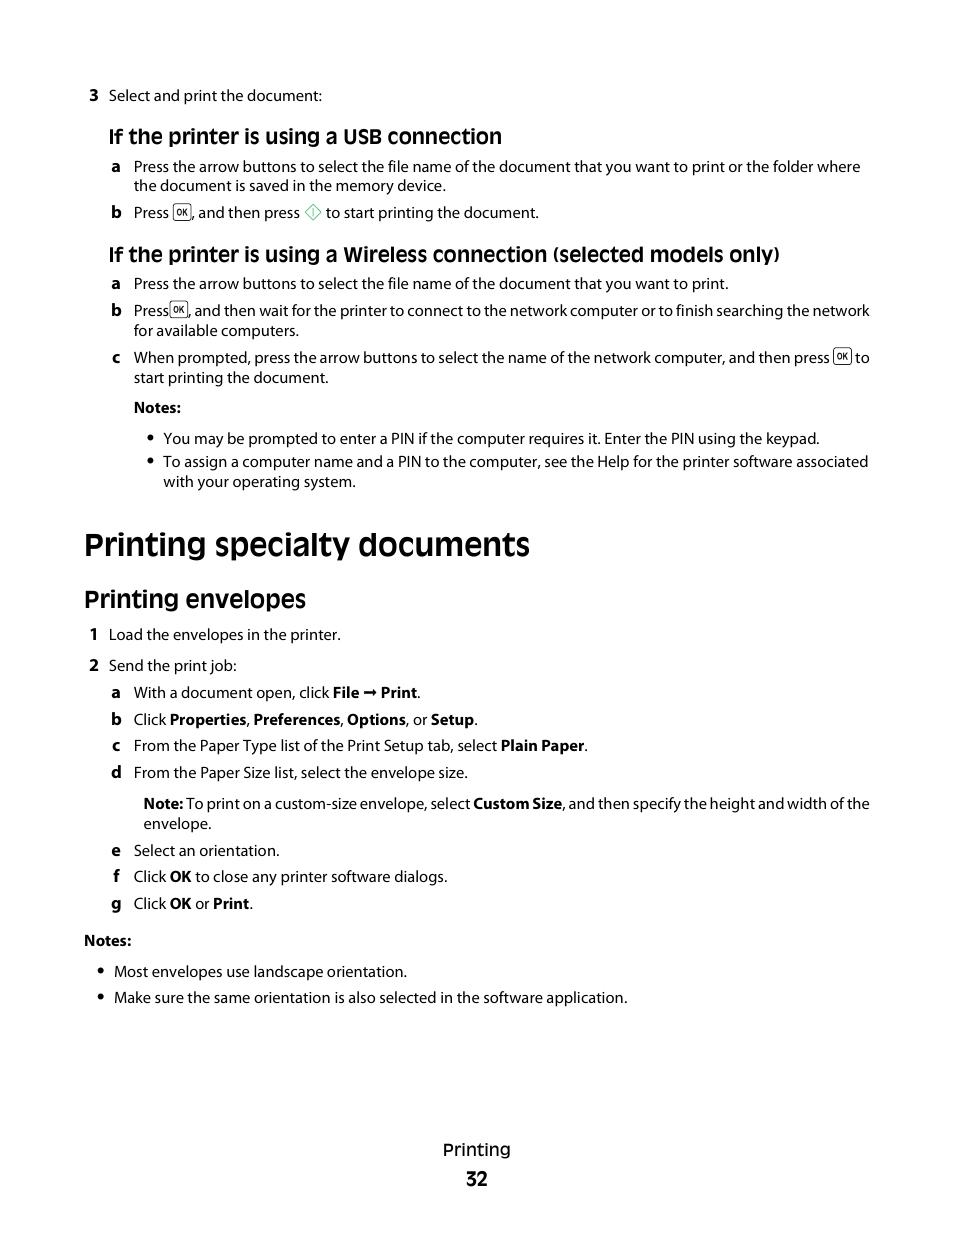 printing specialty documents printing envelopes dell v313w all in rh manualsdir com Dell V313w Wireless Setup Dell Wireless Printer Set Up